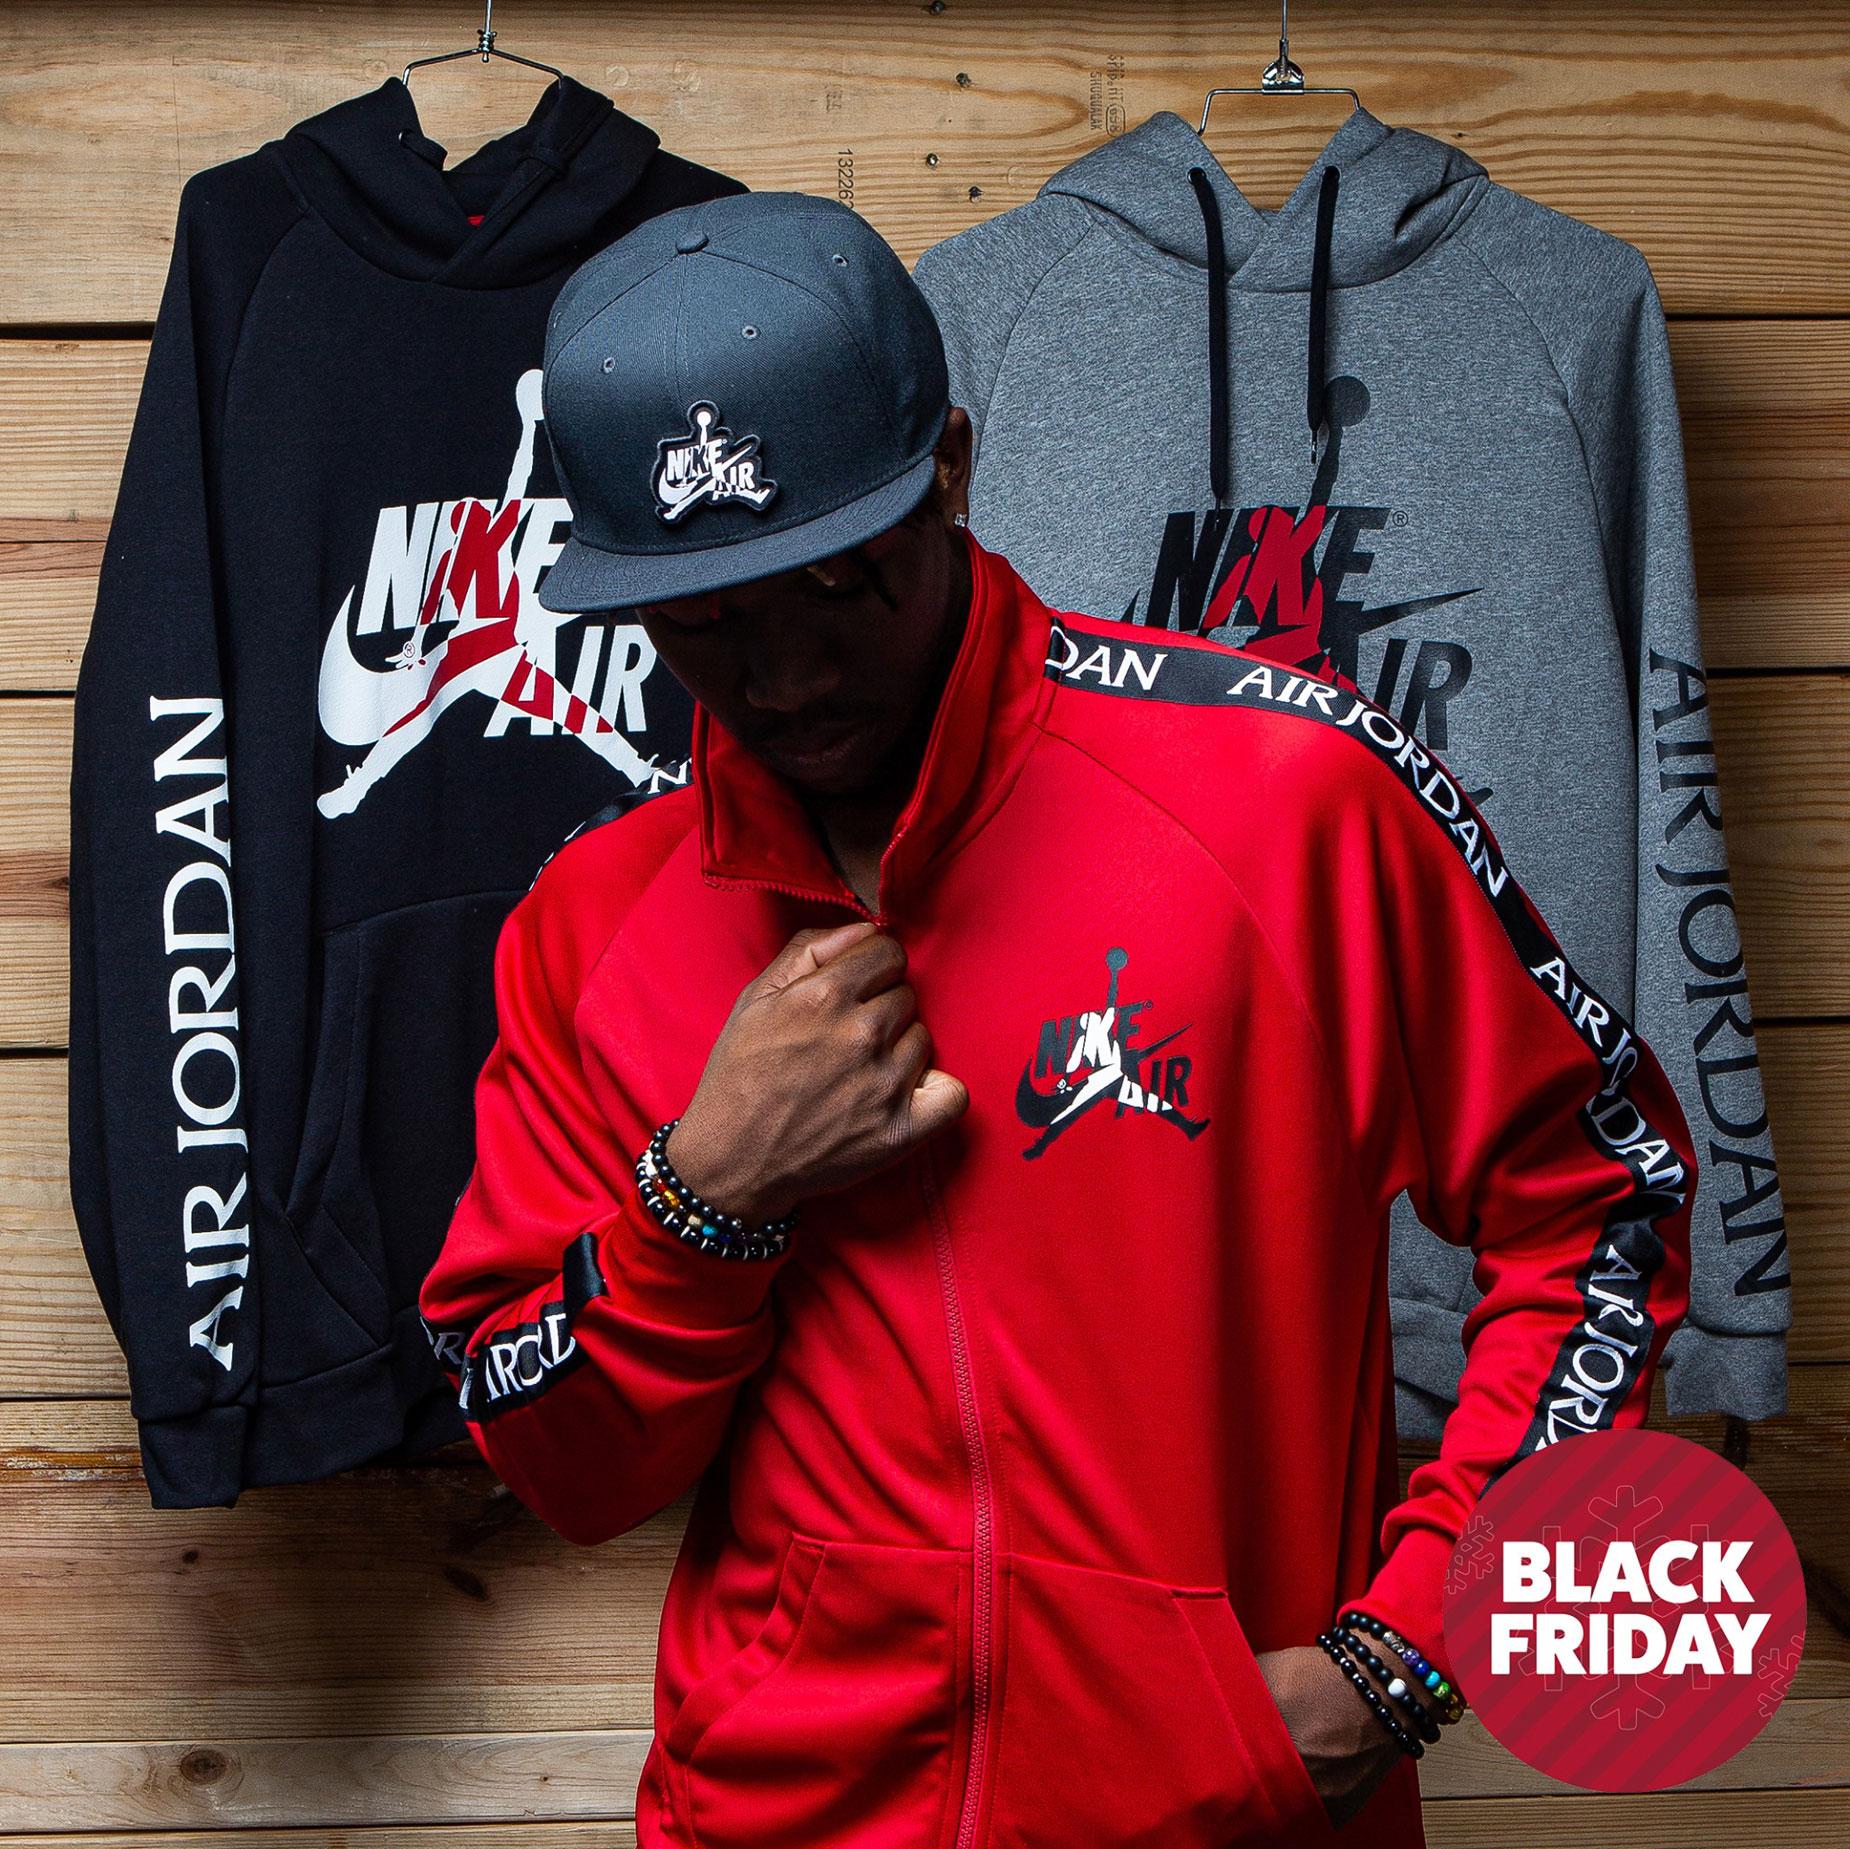 black-friday-2019-jordan-clothing-sale